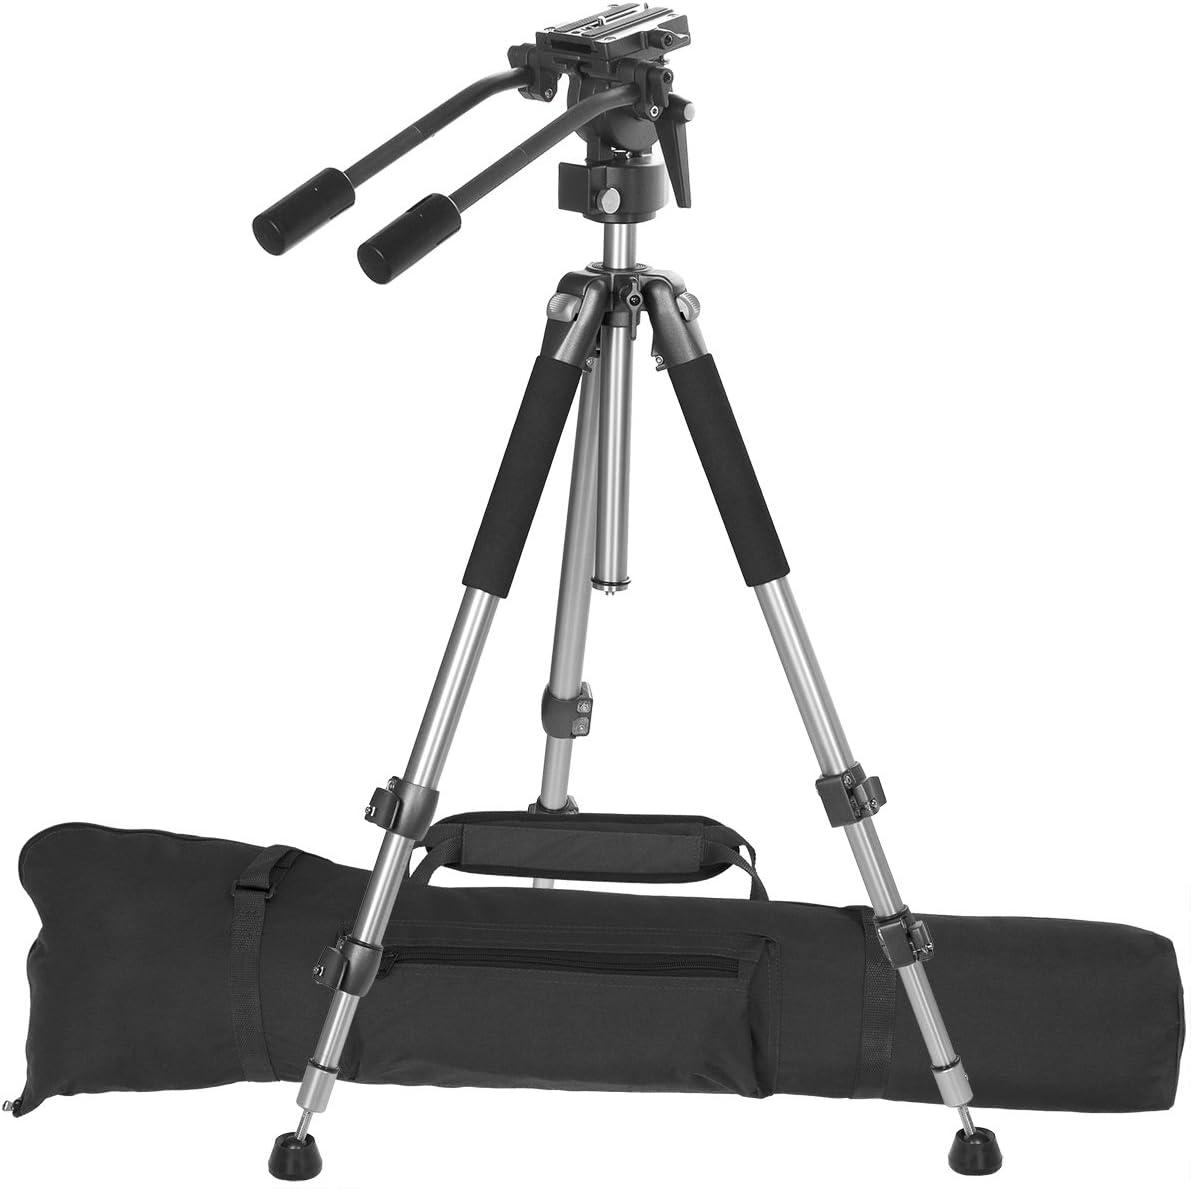 Ravelli AVT 170cm - Trípode profesional de video con cabezal fluido y bolsa de transporte